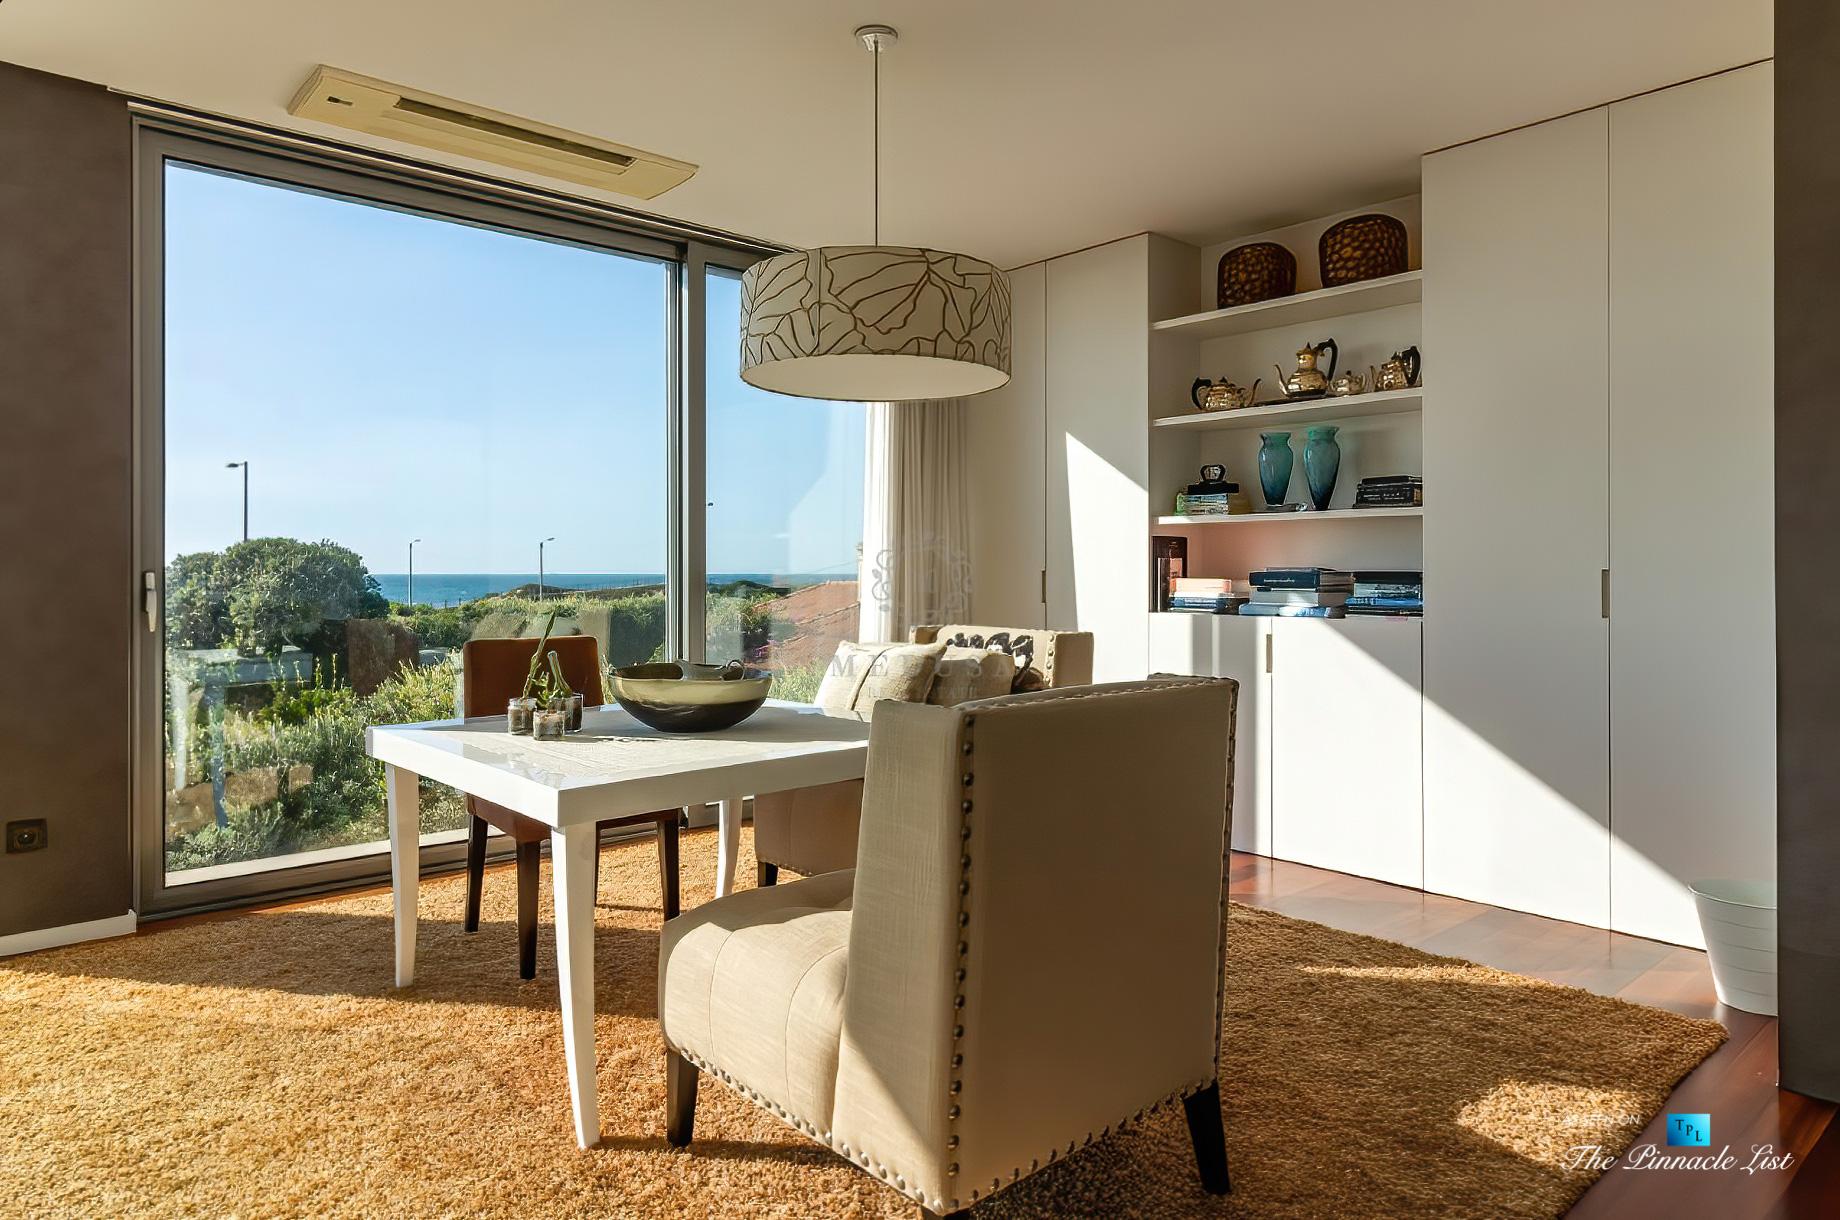 Francelos Beach Luxury T5 Villa - Porto, Portugal - Sitting Area Ocean View - Luxury Real Estate – Modern Home